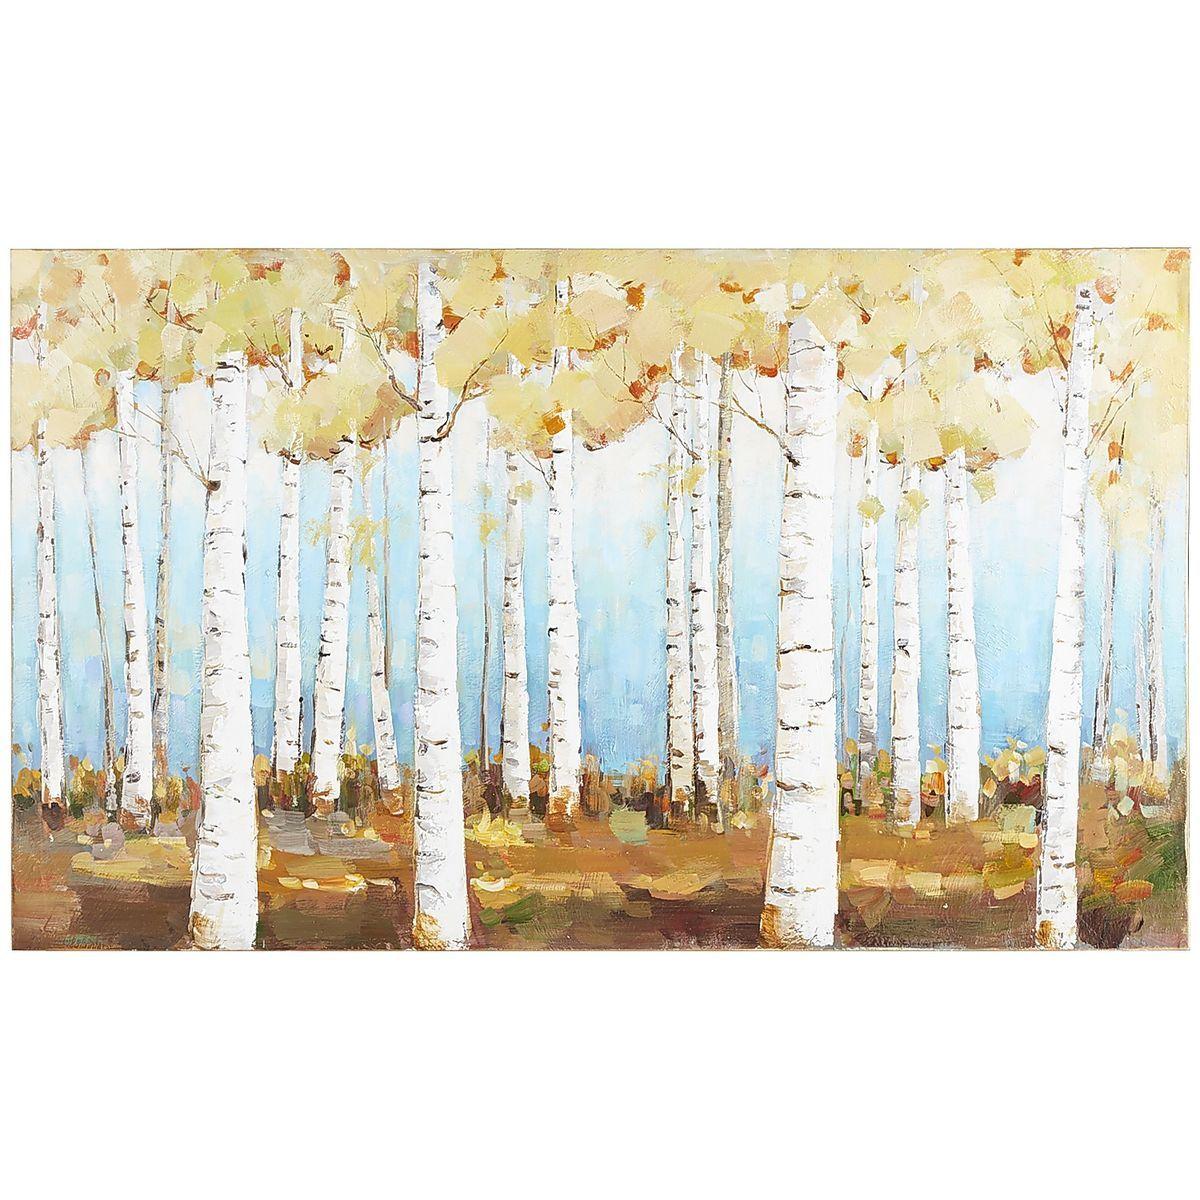 Anticipating Trees Art   Pier 1 Imports   Art   Pinterest